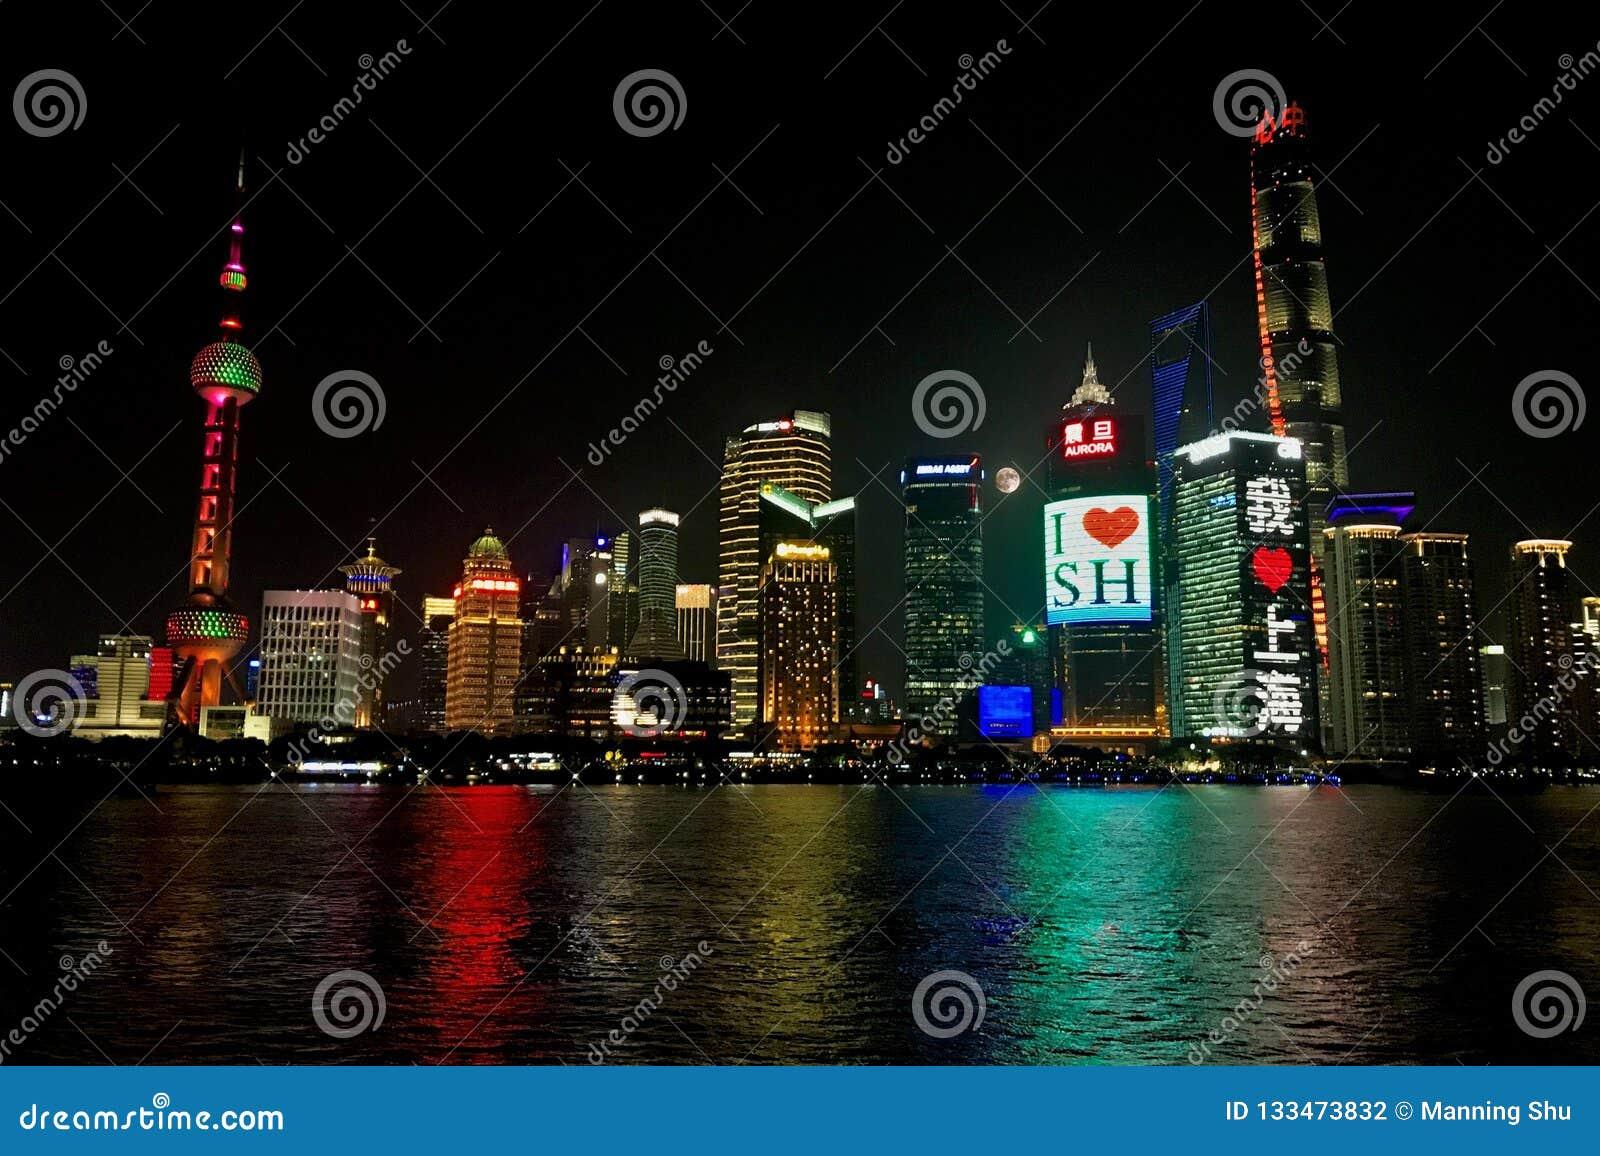 Shanghai Night Skyline With Full Moon